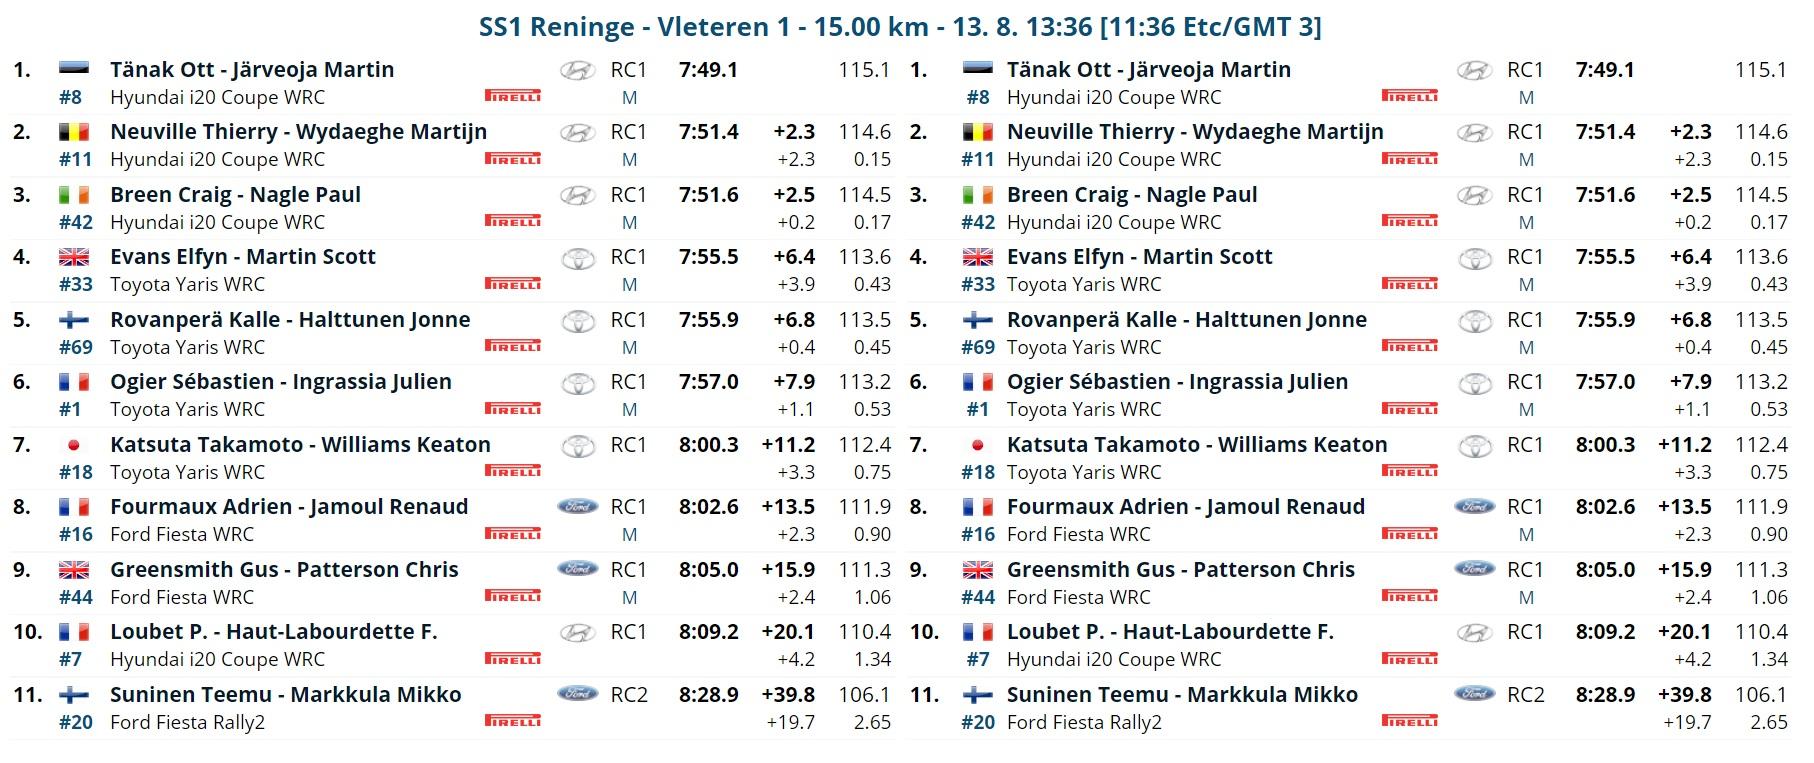 WRC: RENTIES Ypres Rally [13-15 Agosto] - Página 2 E8q5PwXWQAgV6ZO?format=jpg&name=large